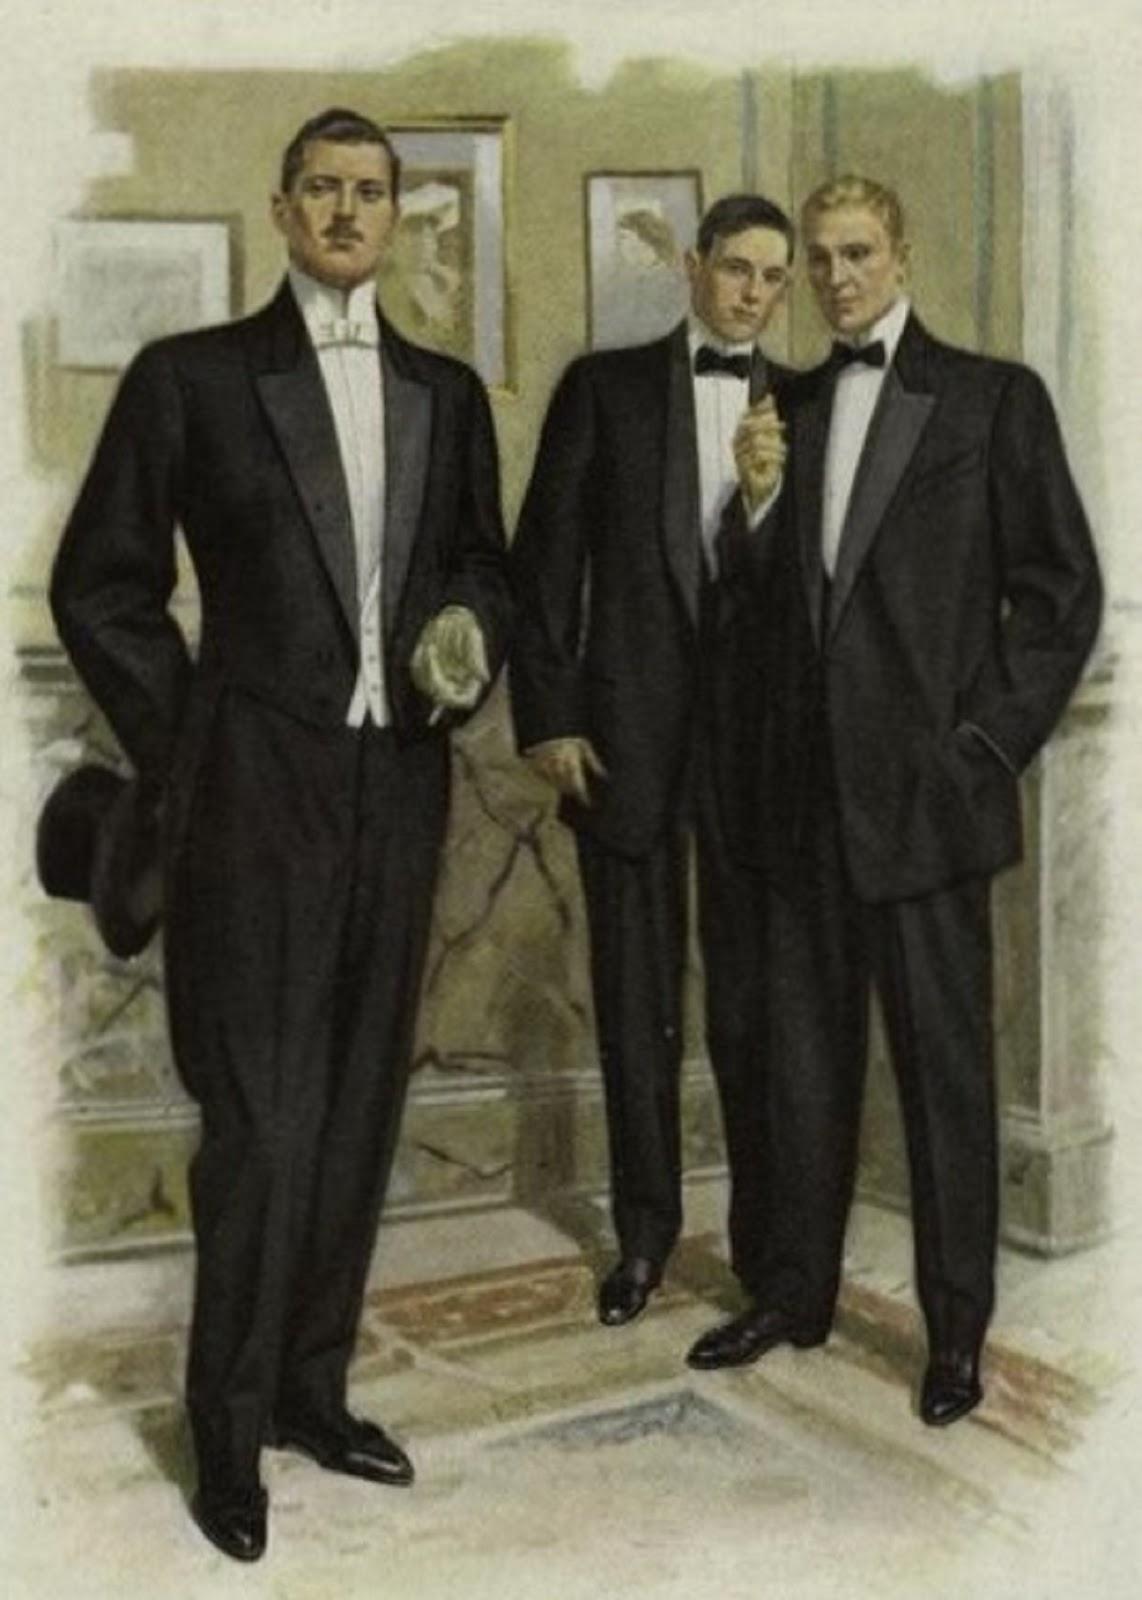 Men's evening wear